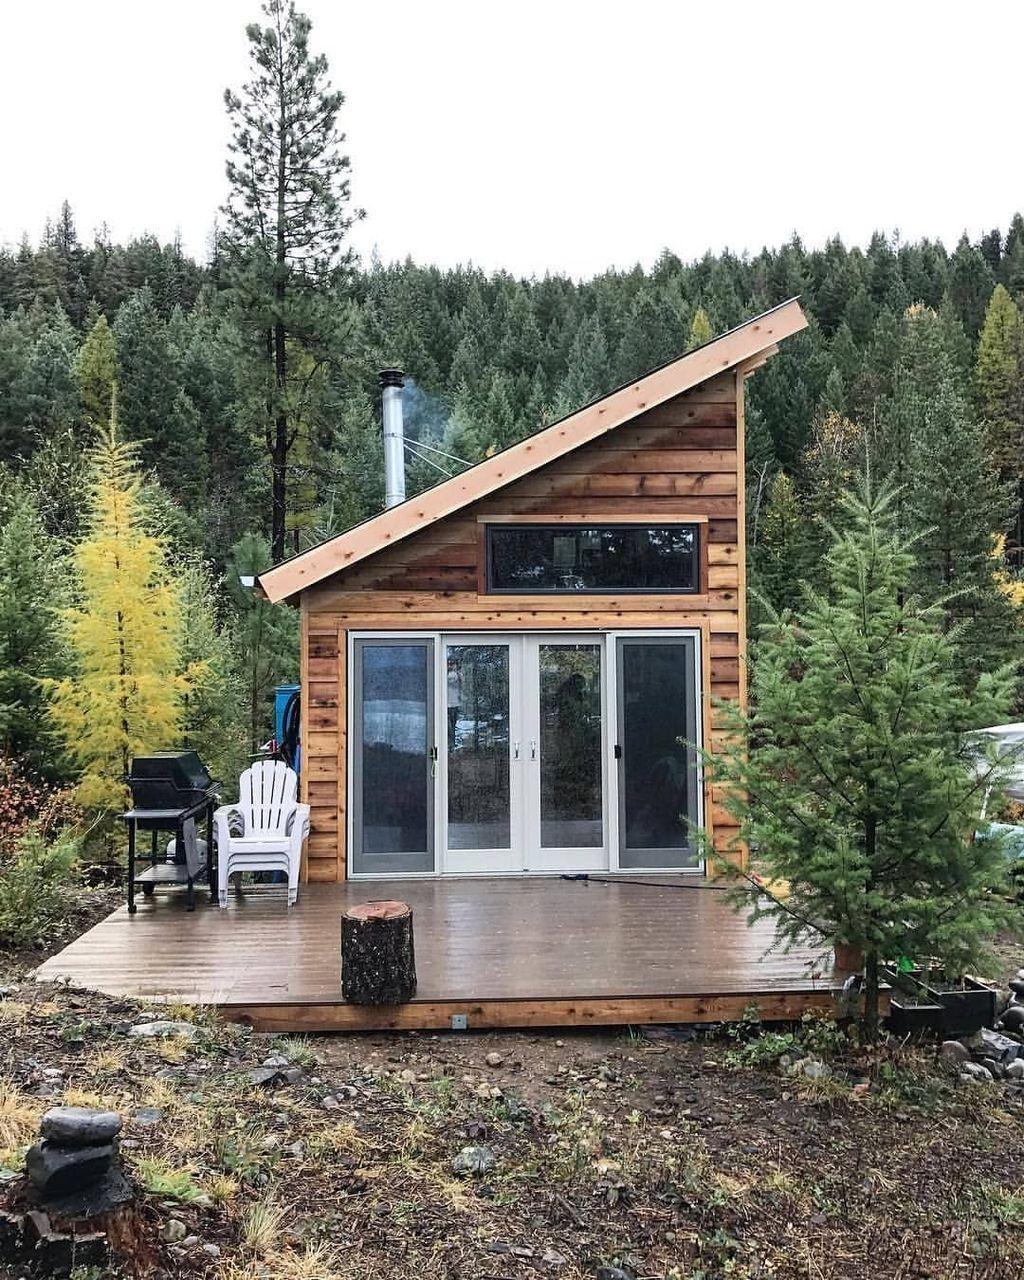 46 Stunning Tiny House Design Ideas Pimphomee Tiny House Cabin Tiny House Interior Design Small House